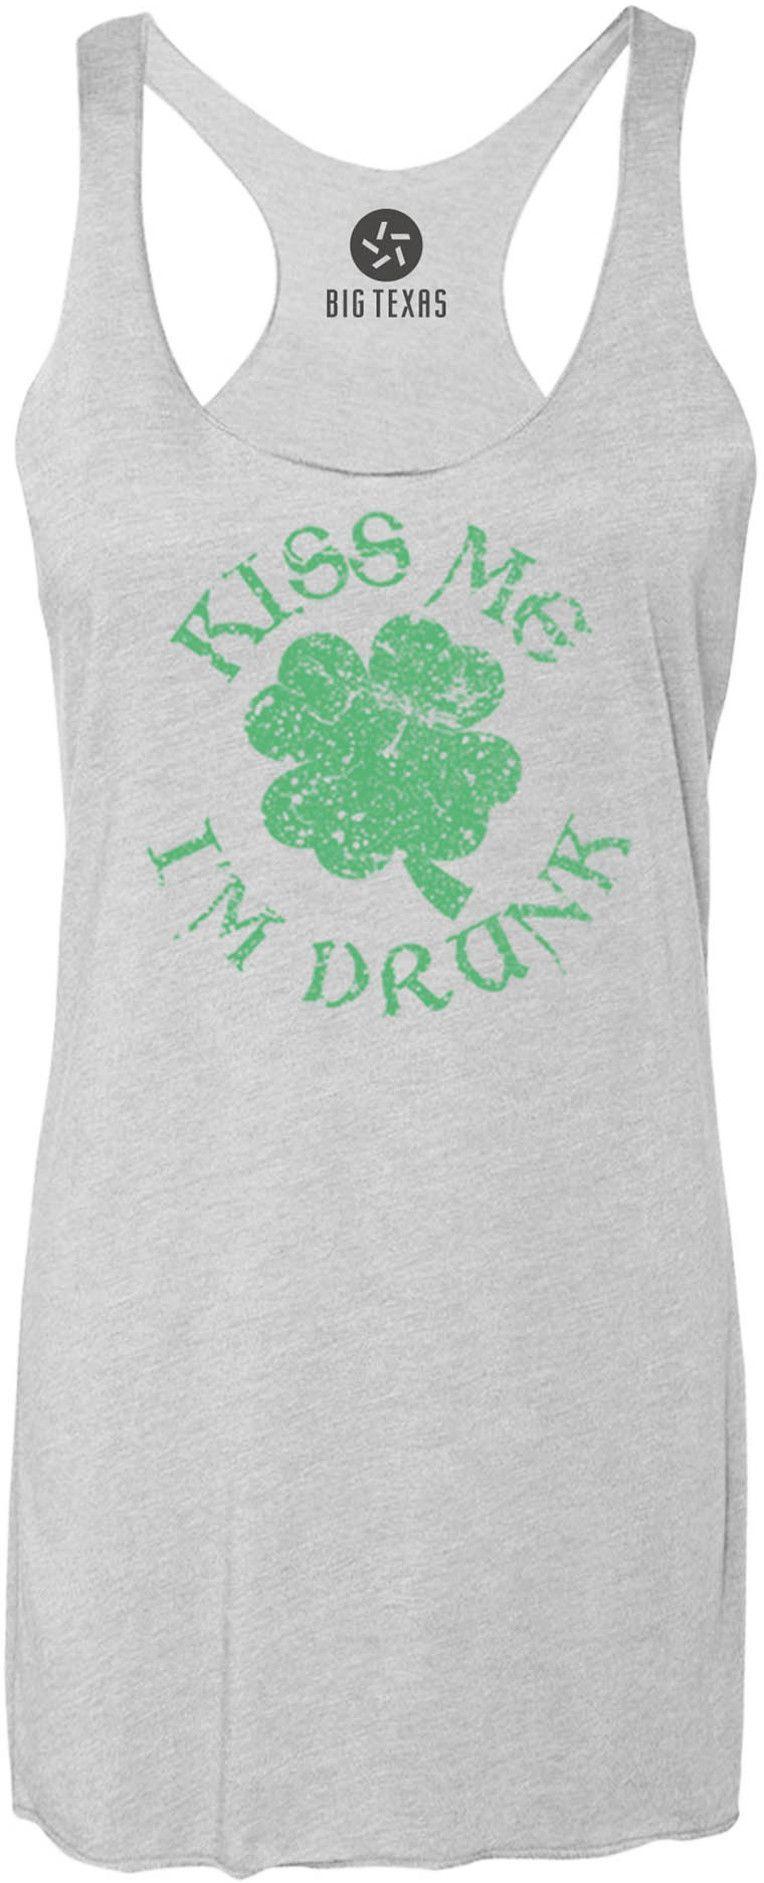 Distressed Kiss Me Im Drunk (Green) Tri-Blend Racerback Tank-Top